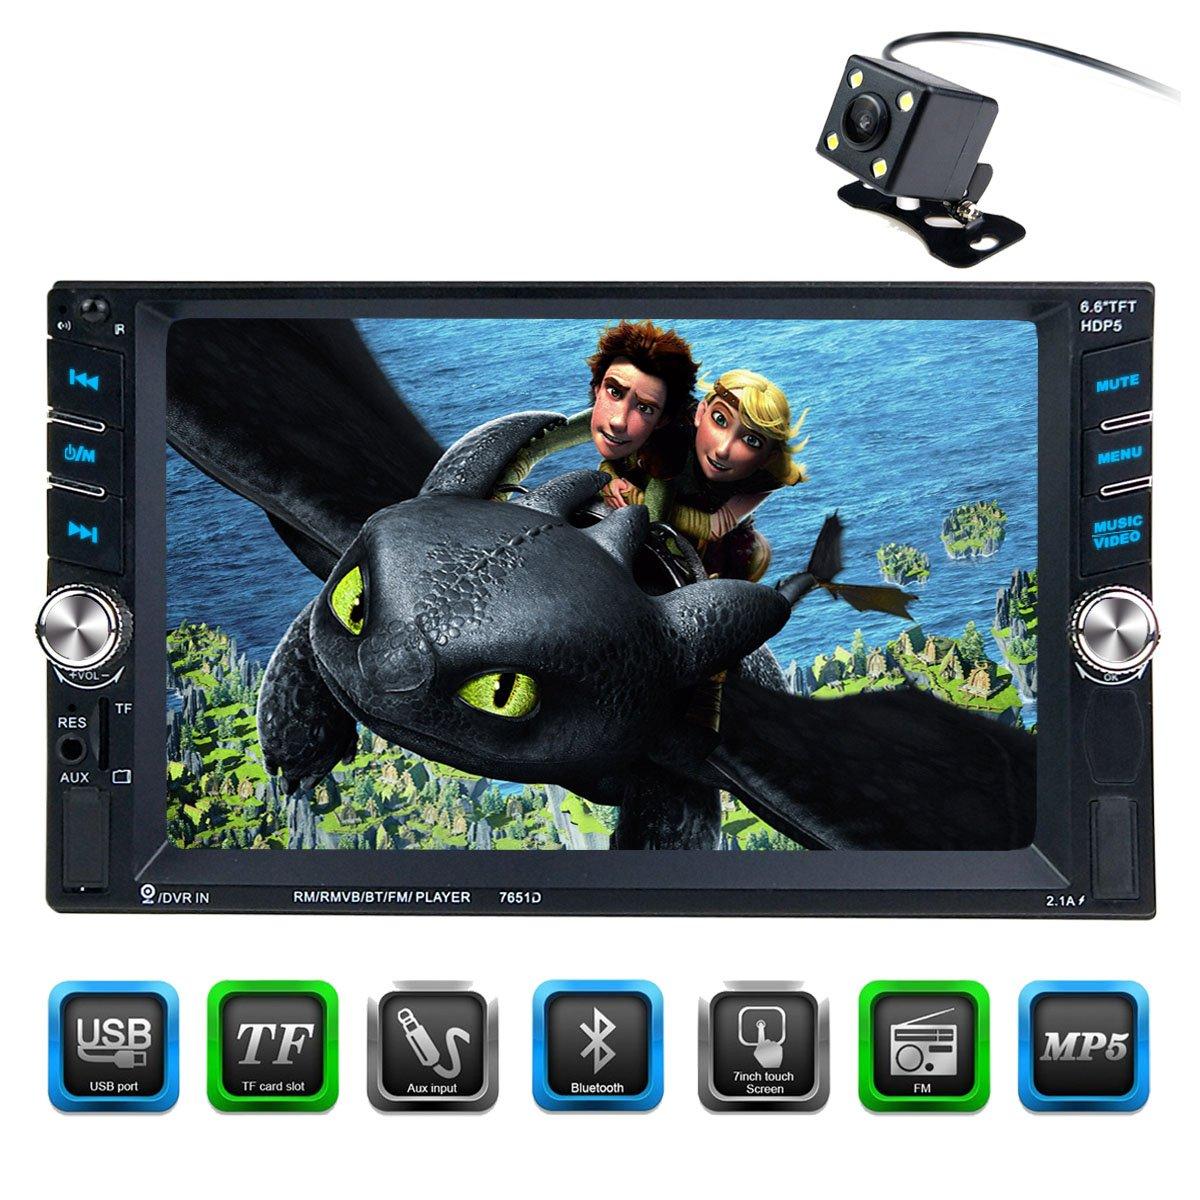 Cared 6.6インチタッチスクリーンカーステレオmp5プレーヤー、ユニバーサルダブルDIN、Bluetoothカーオーディオ受信機、ステアリングホイール制御、背面カメラ、mp3 USB/SD/AUX IN、MirrorLink、DVR入力、ワイヤレスリモート B078LYYVYW